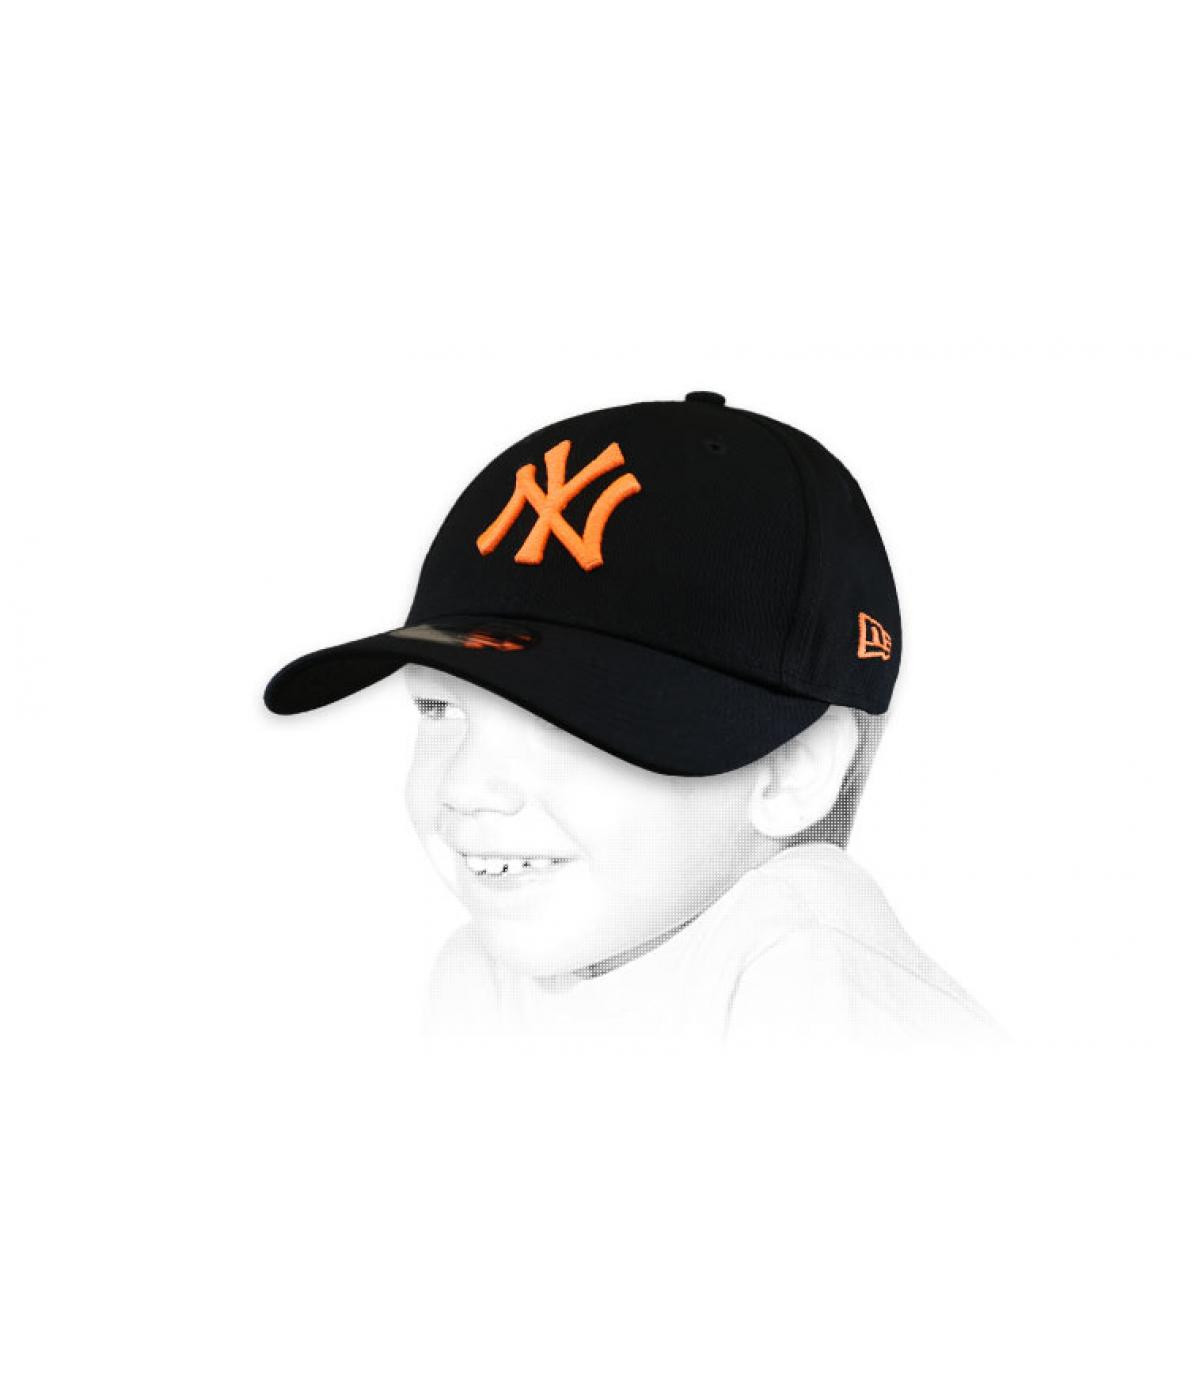 NY oranje zwarte kinderpet